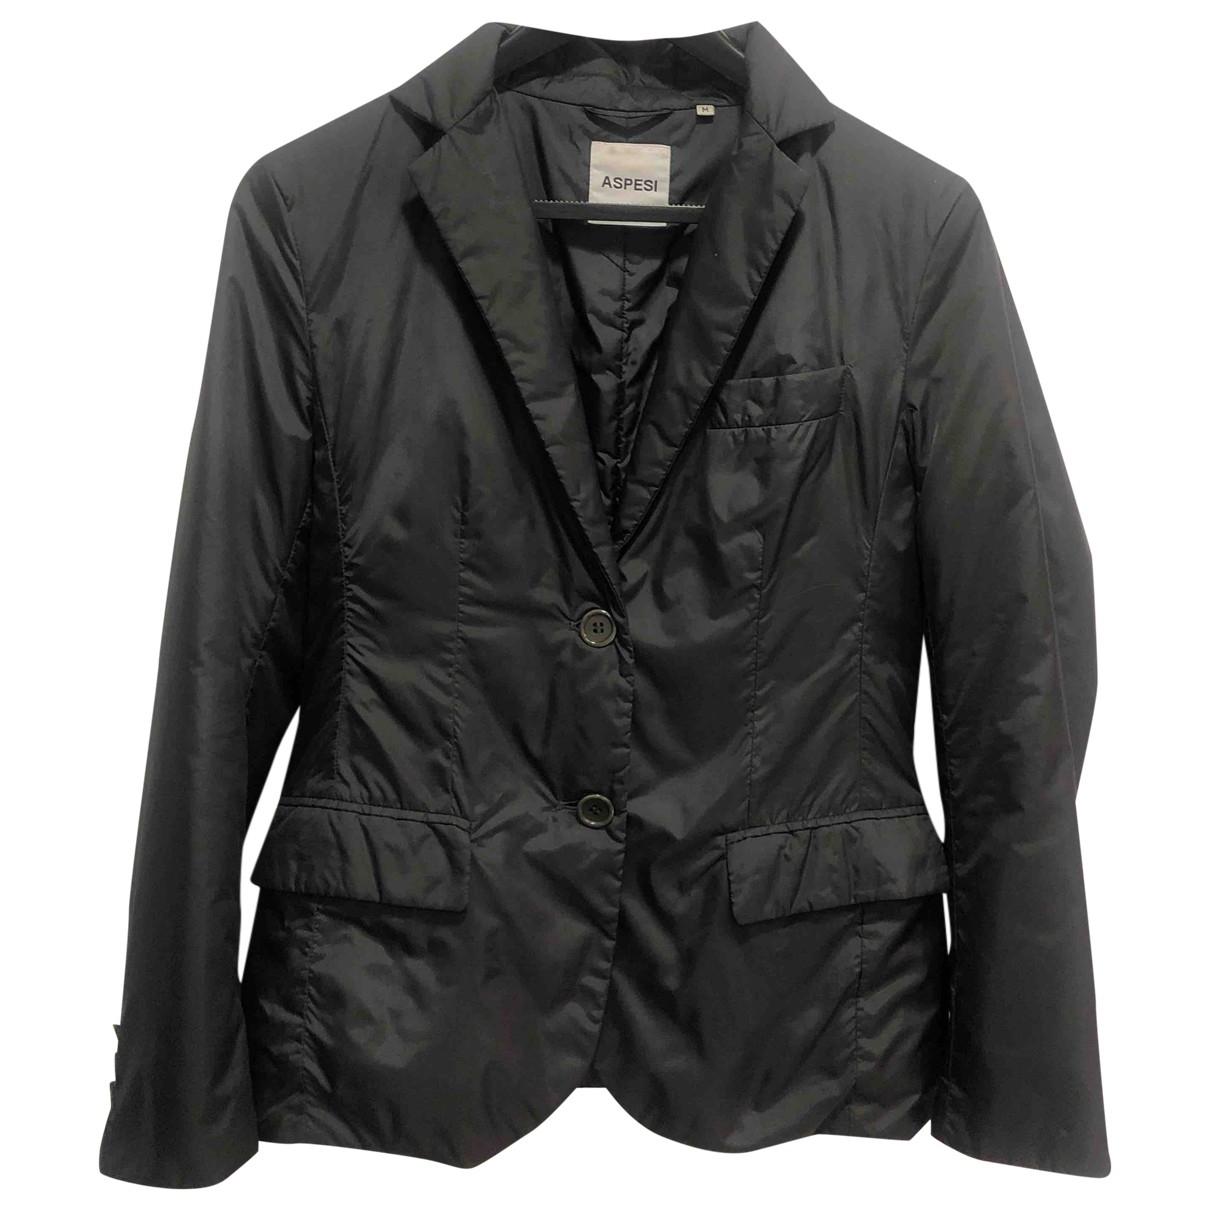 Aspesi \N Black jacket for Women M International